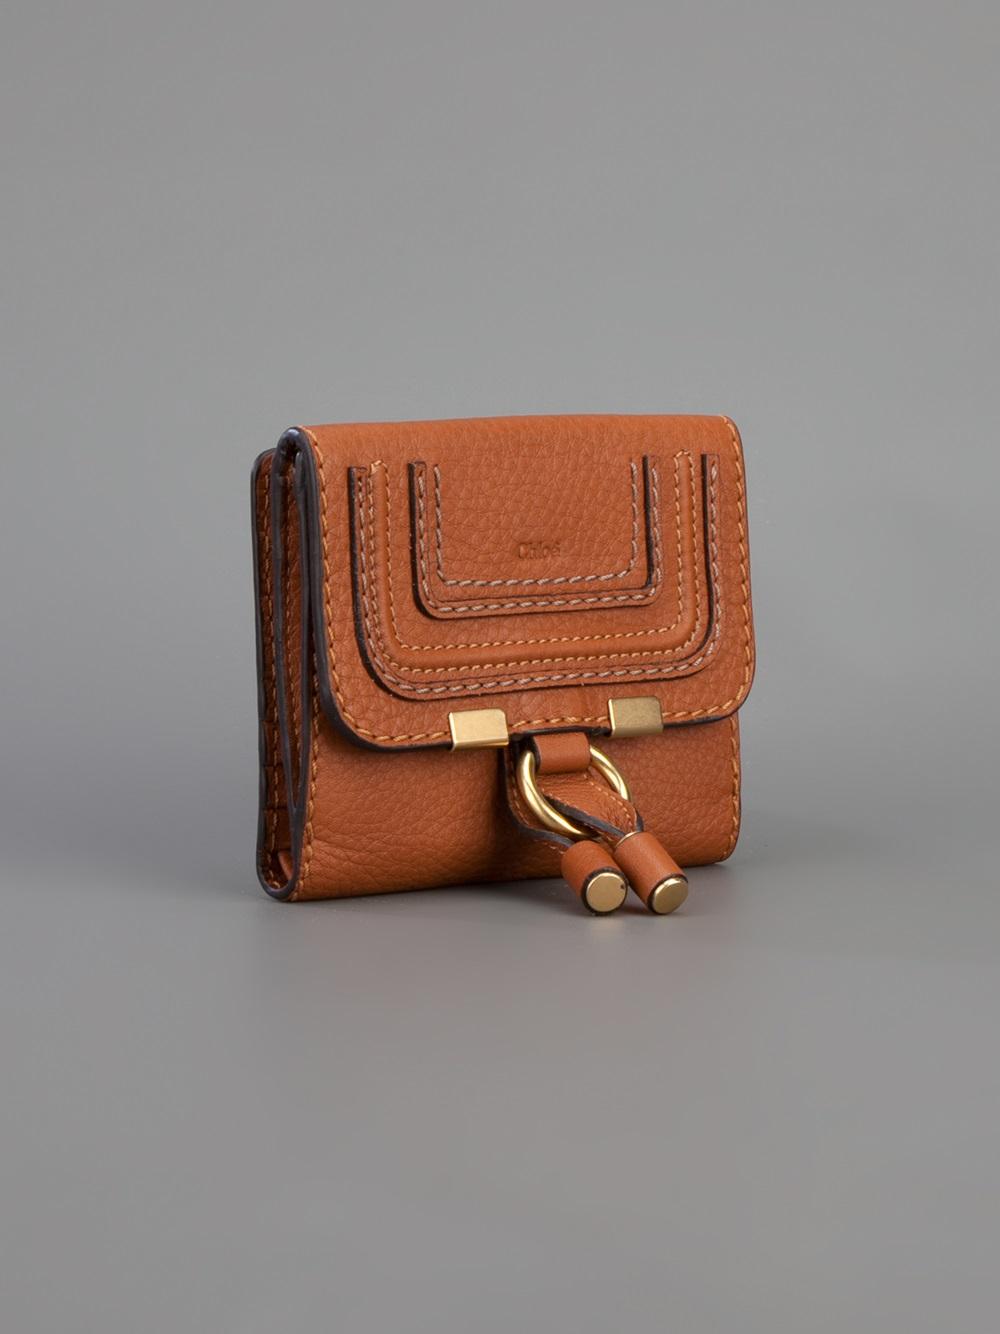 chloe satchel bag - chloe marcie leather continental wallet, chloe wallets online